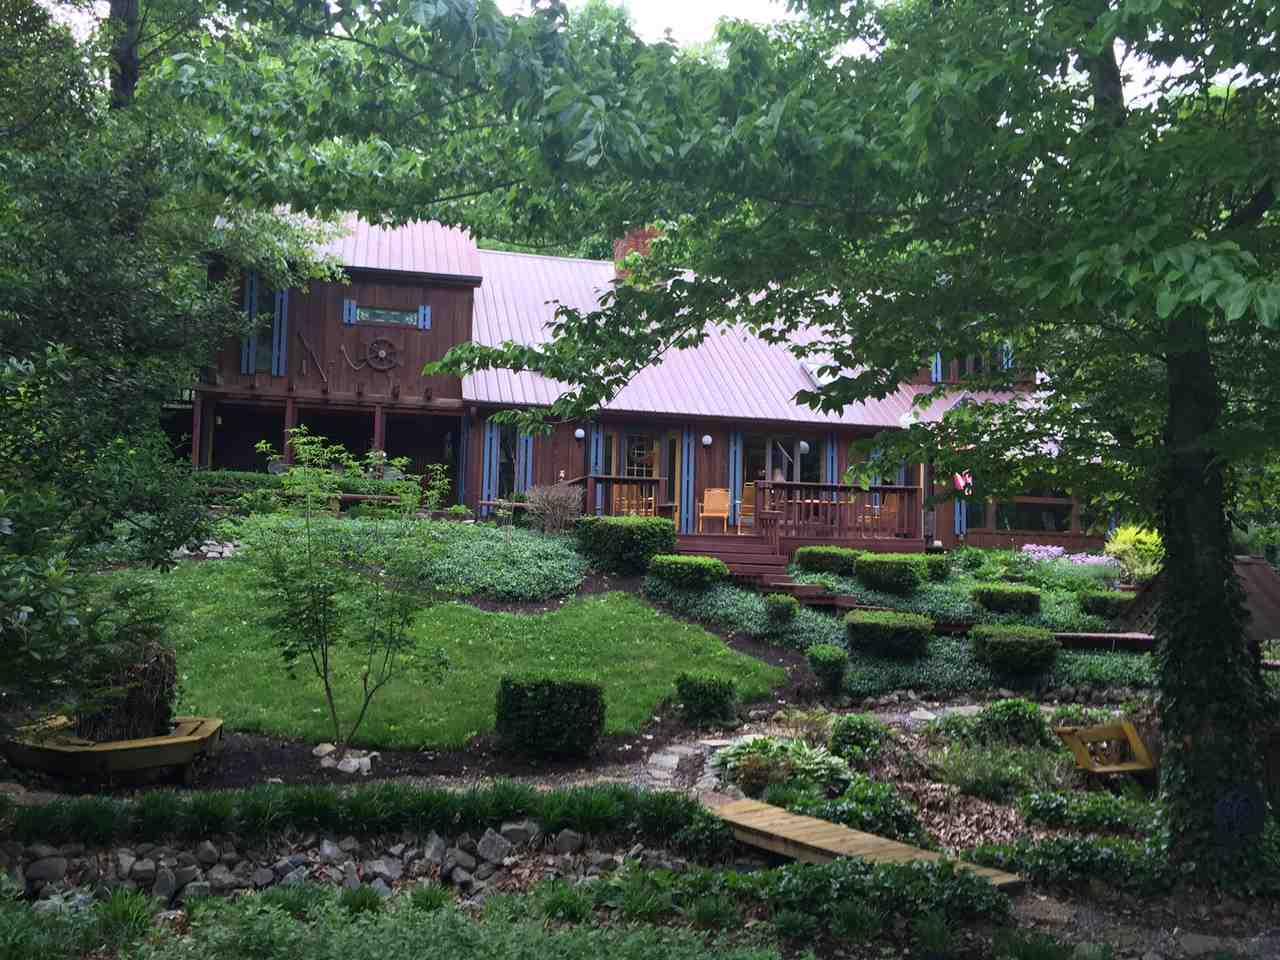 Real Estate for Sale, ListingId: 31881133, Eddyville,KY42038